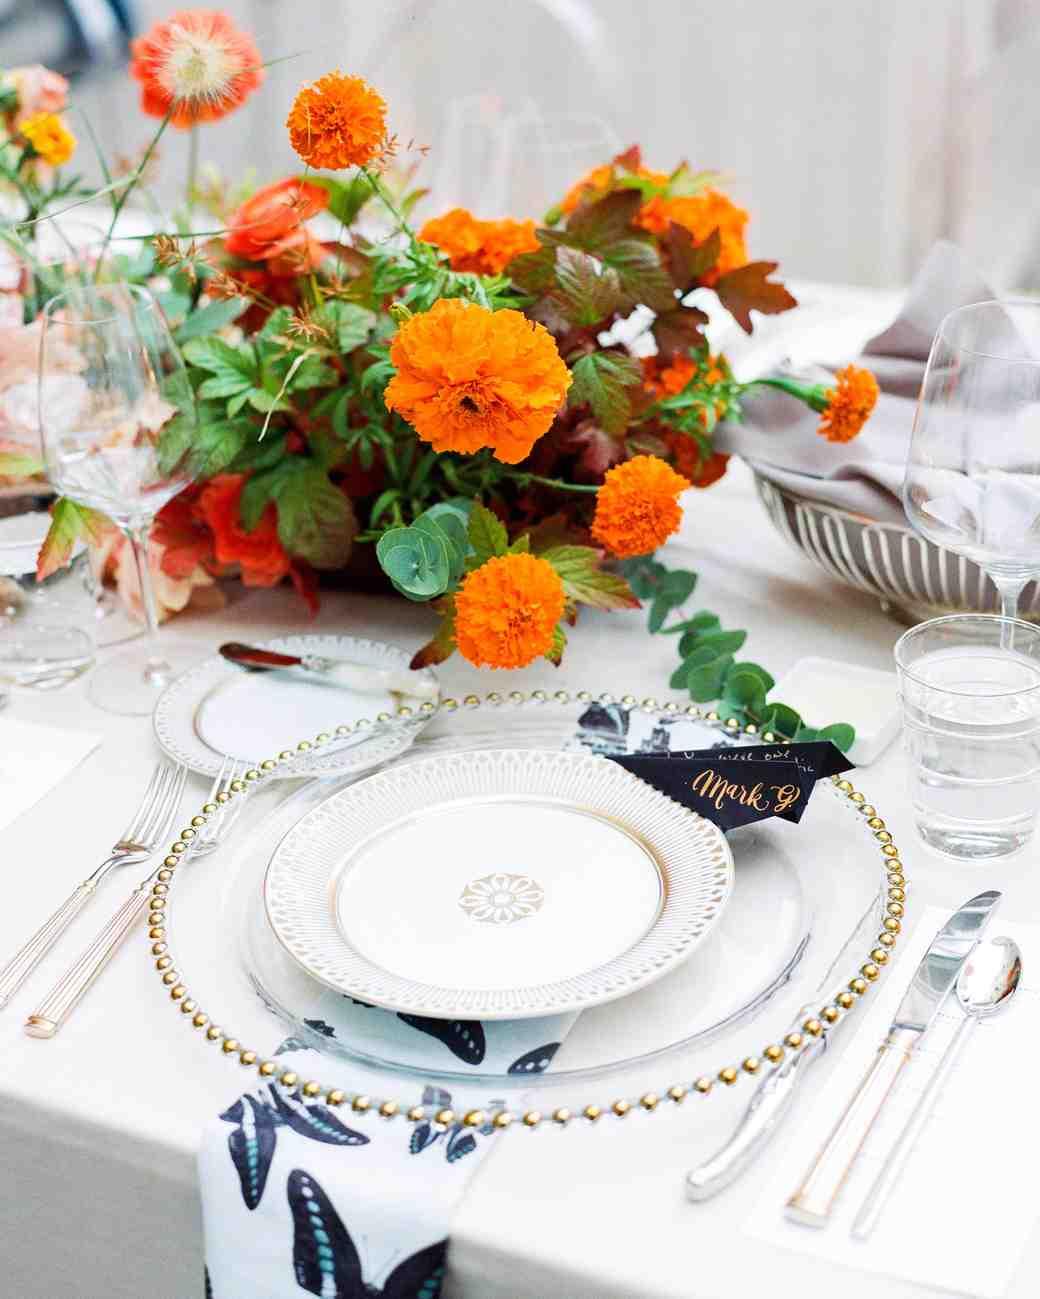 natalie louis wedding place setting